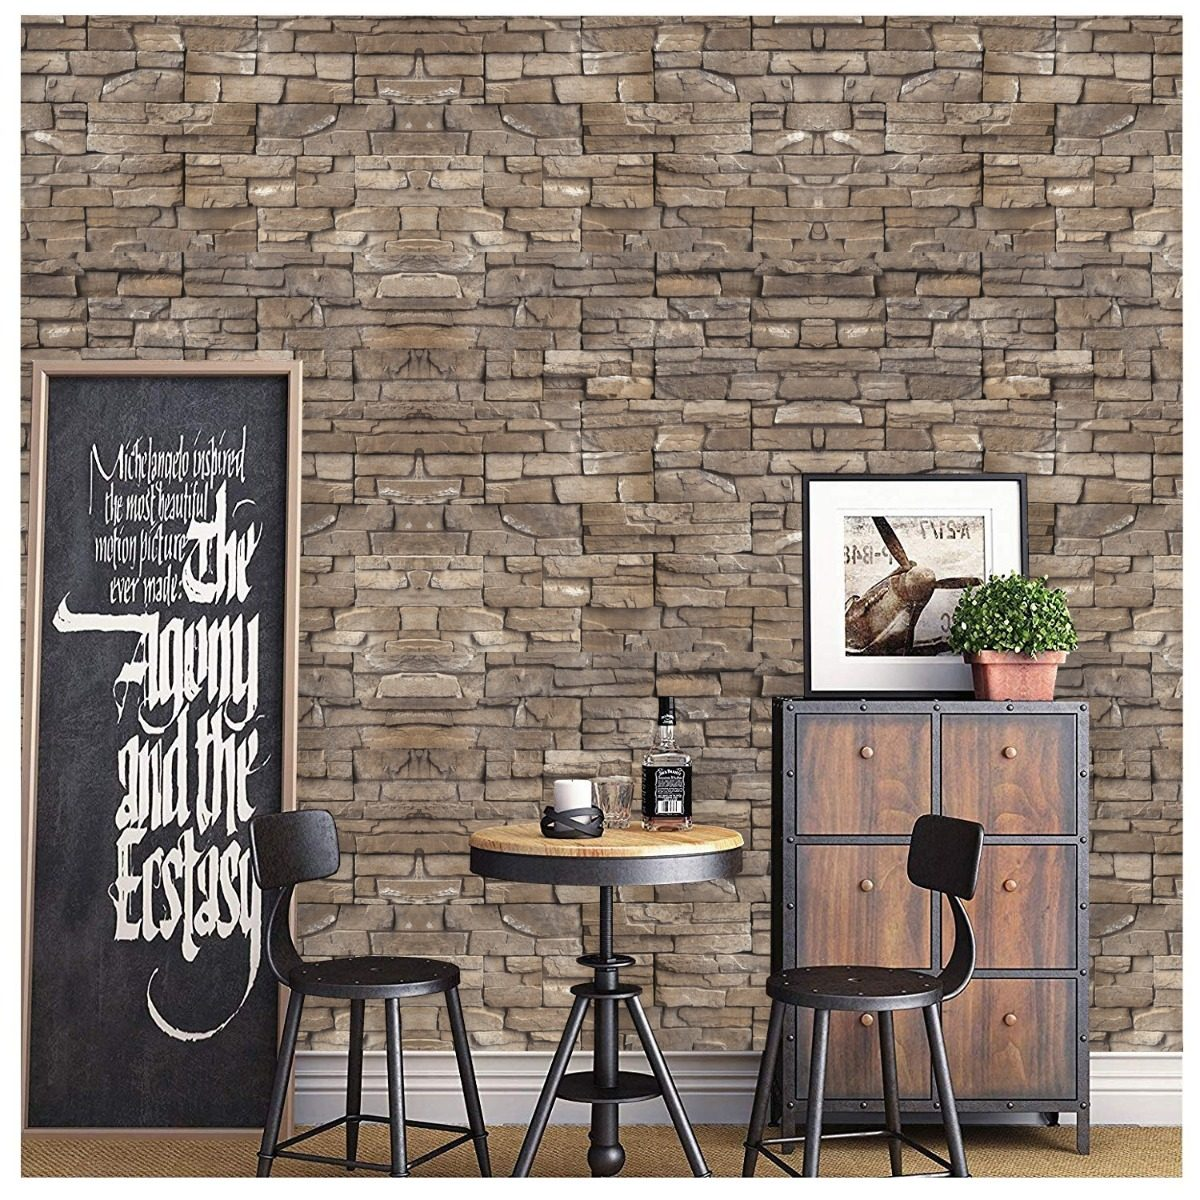 519d15f9e adesivo papel parede decorativo revestimento pedras tijolo. Carregando zoom.